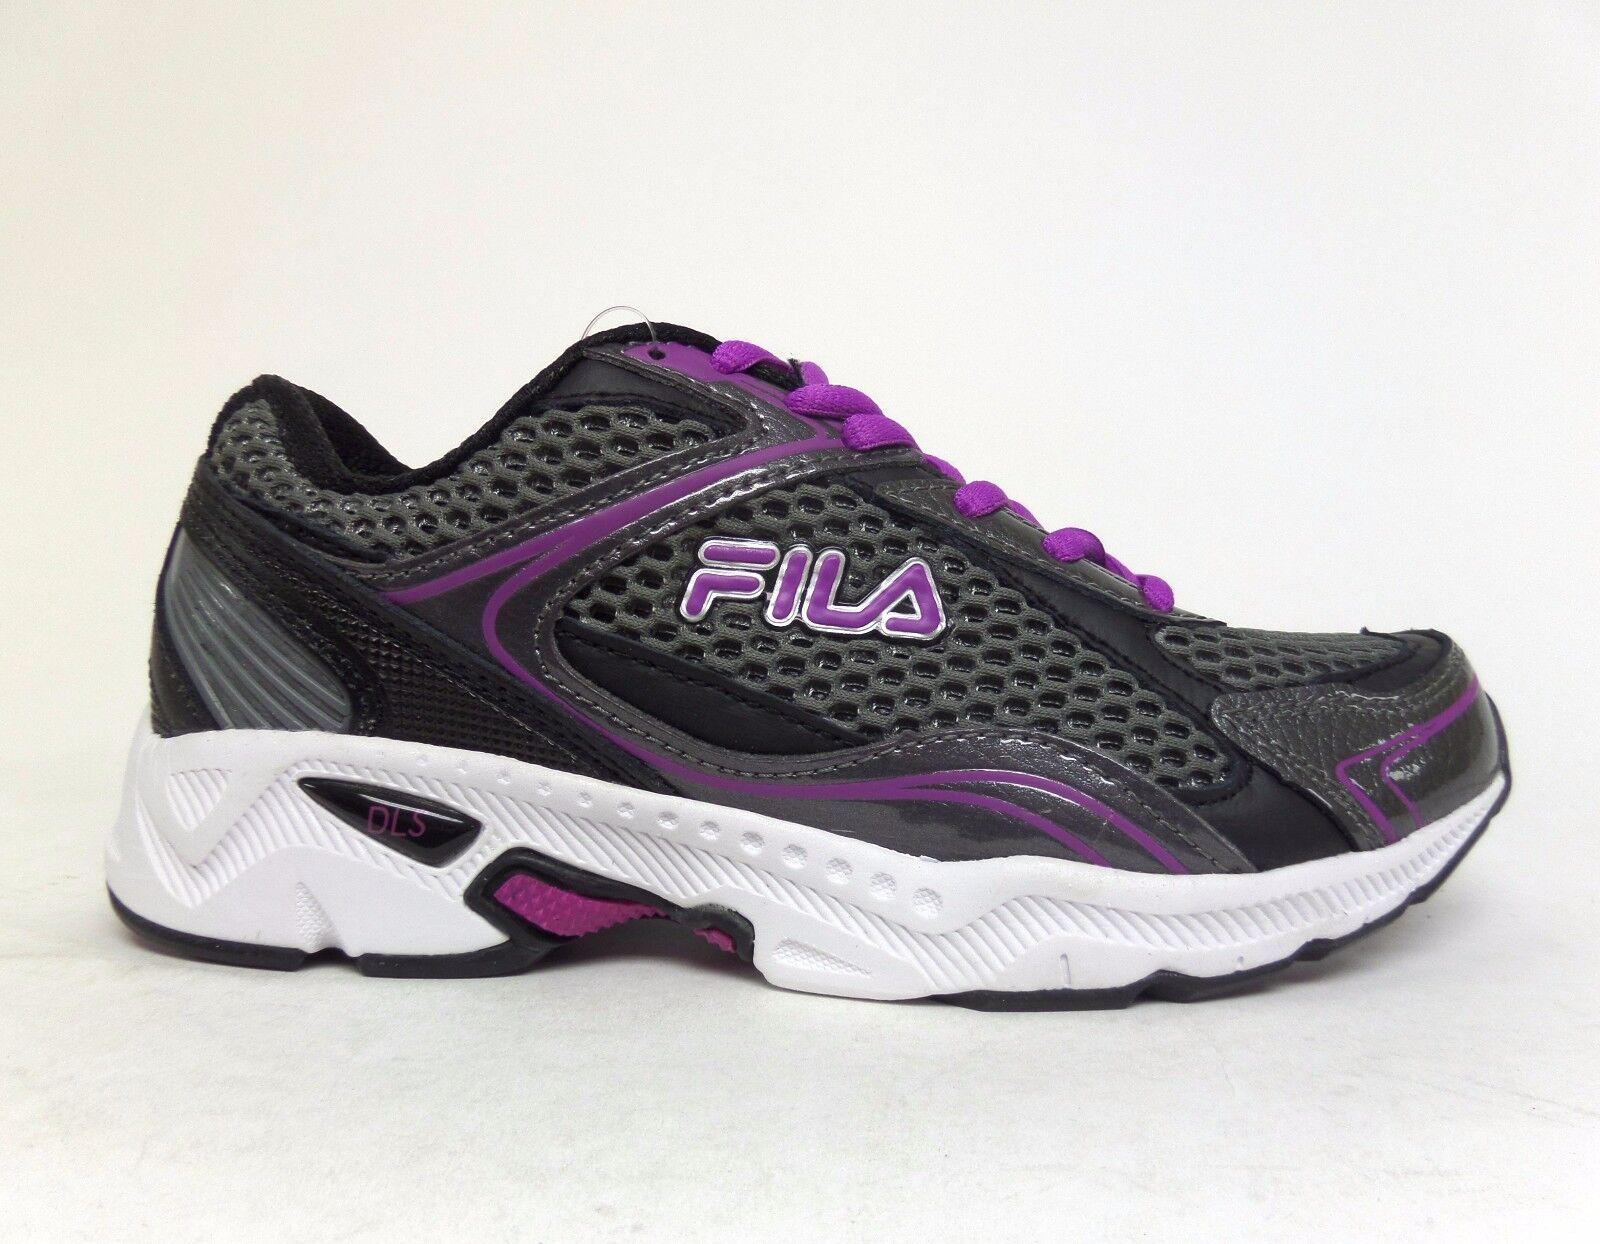 FILA Women's TREXA LITE 4 COOLMAX Running Shoes Charcoal/Purple 5SR20326-087 a2 Casual wild